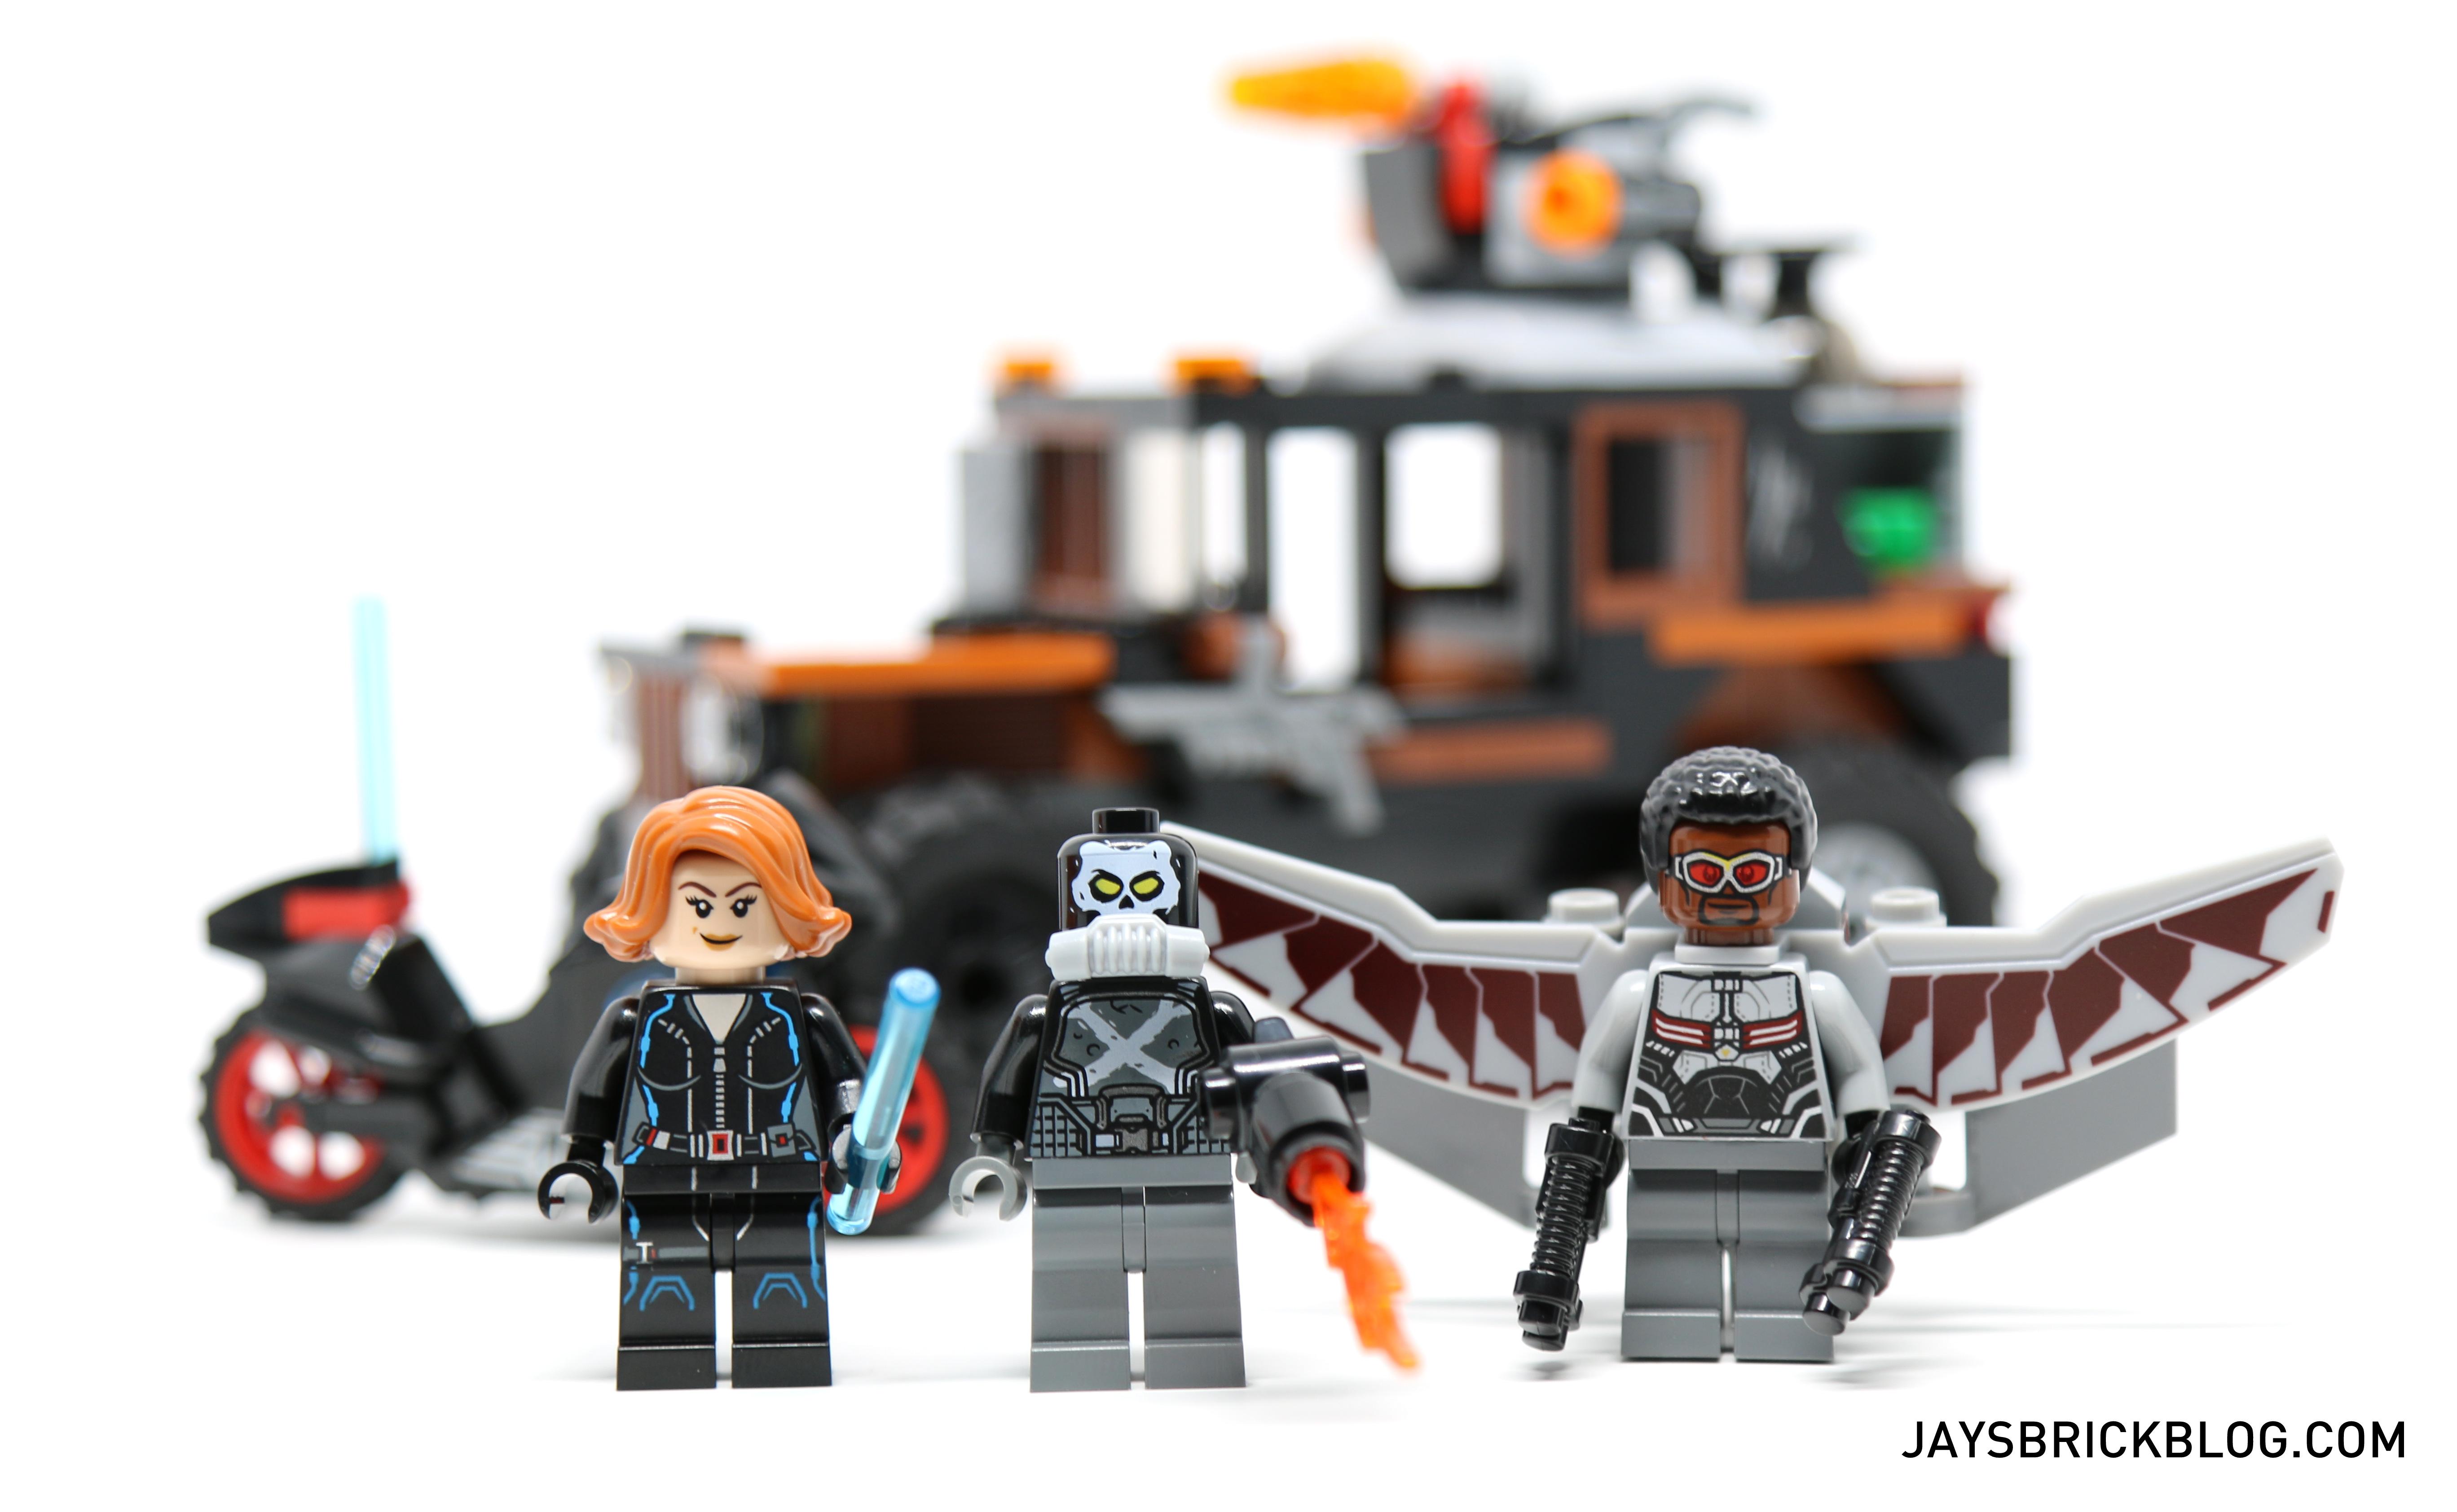 Marvel DC Lego mini figure FALCON 76050 captain america civil war LEGO Bau- & Konstruktionsspielzeug Baukästen & Konstruktion